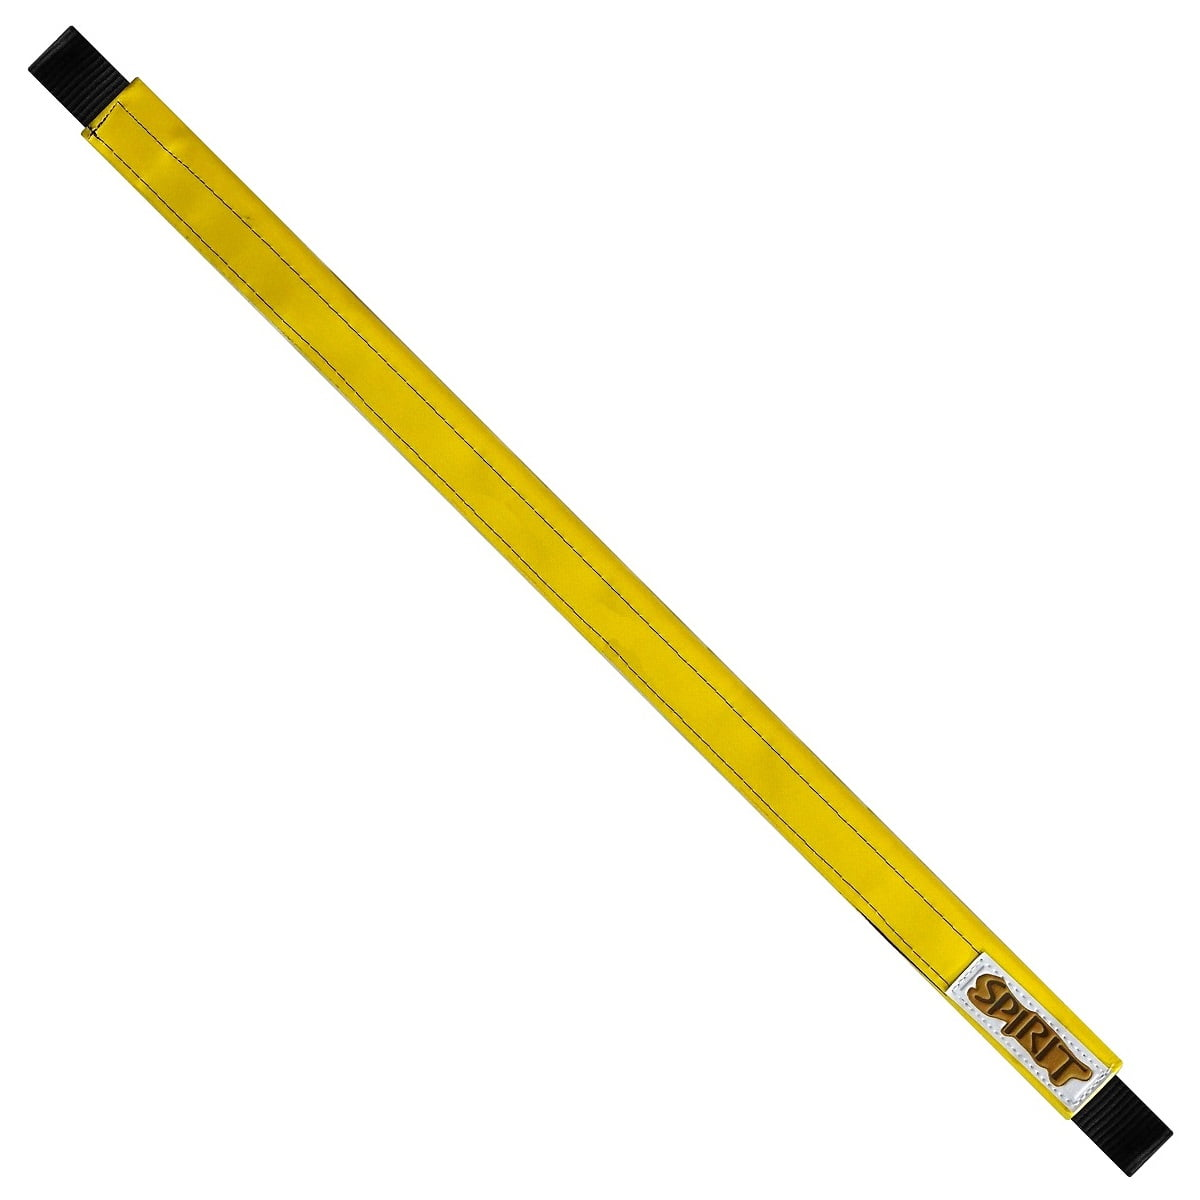 Protetor de Corda PVC 60cm PROTOP Spirit Alpimonte Amarelo